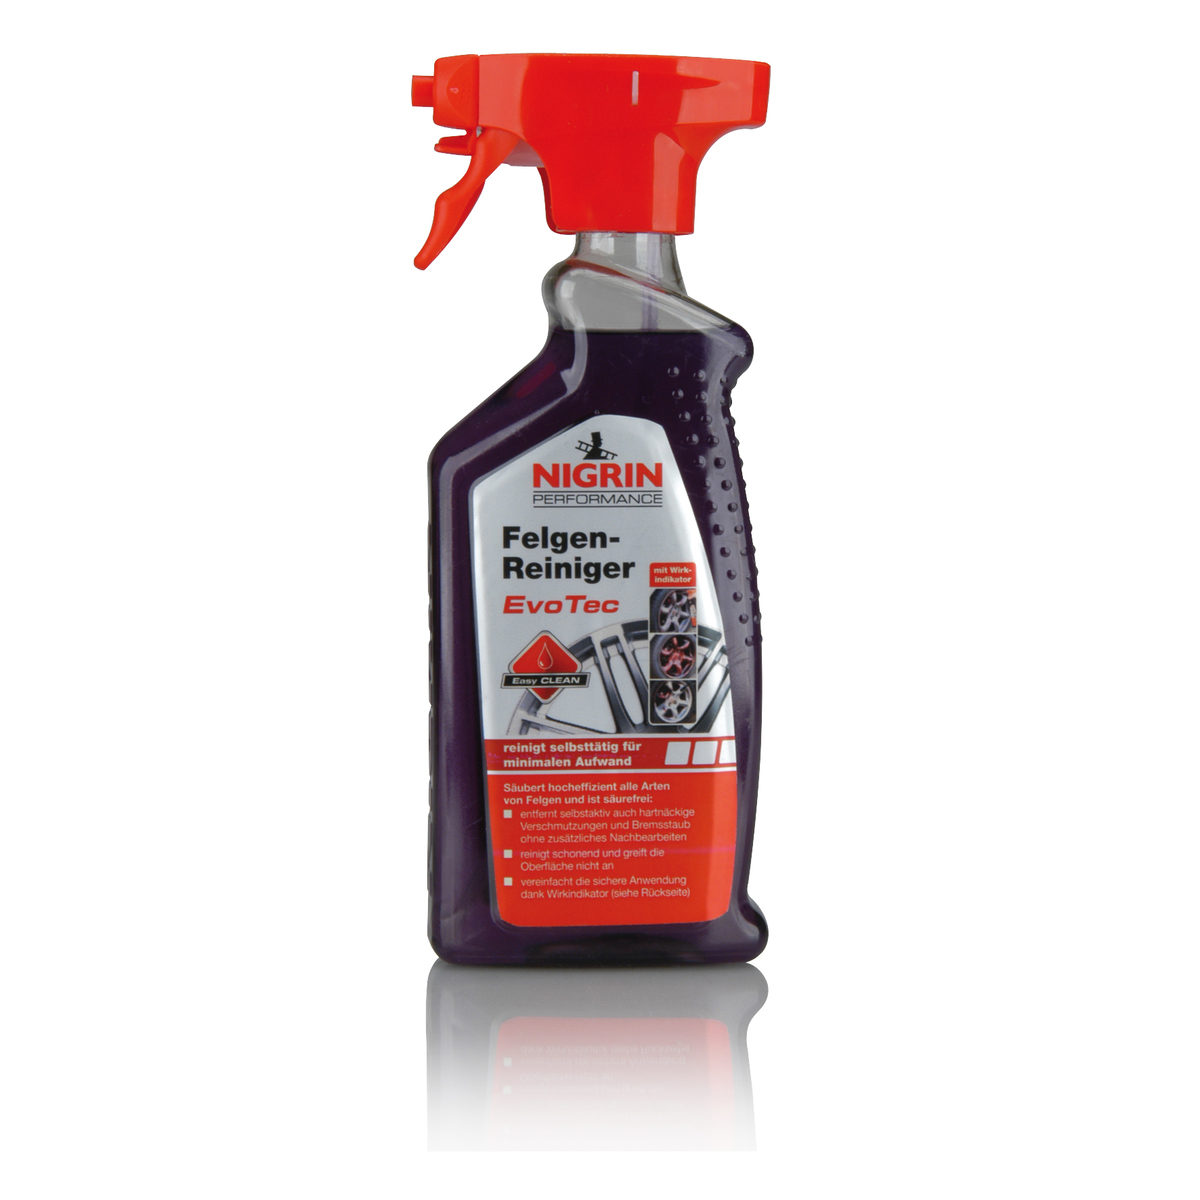 NIGRIN Performance Rims Cleaner (500ml)